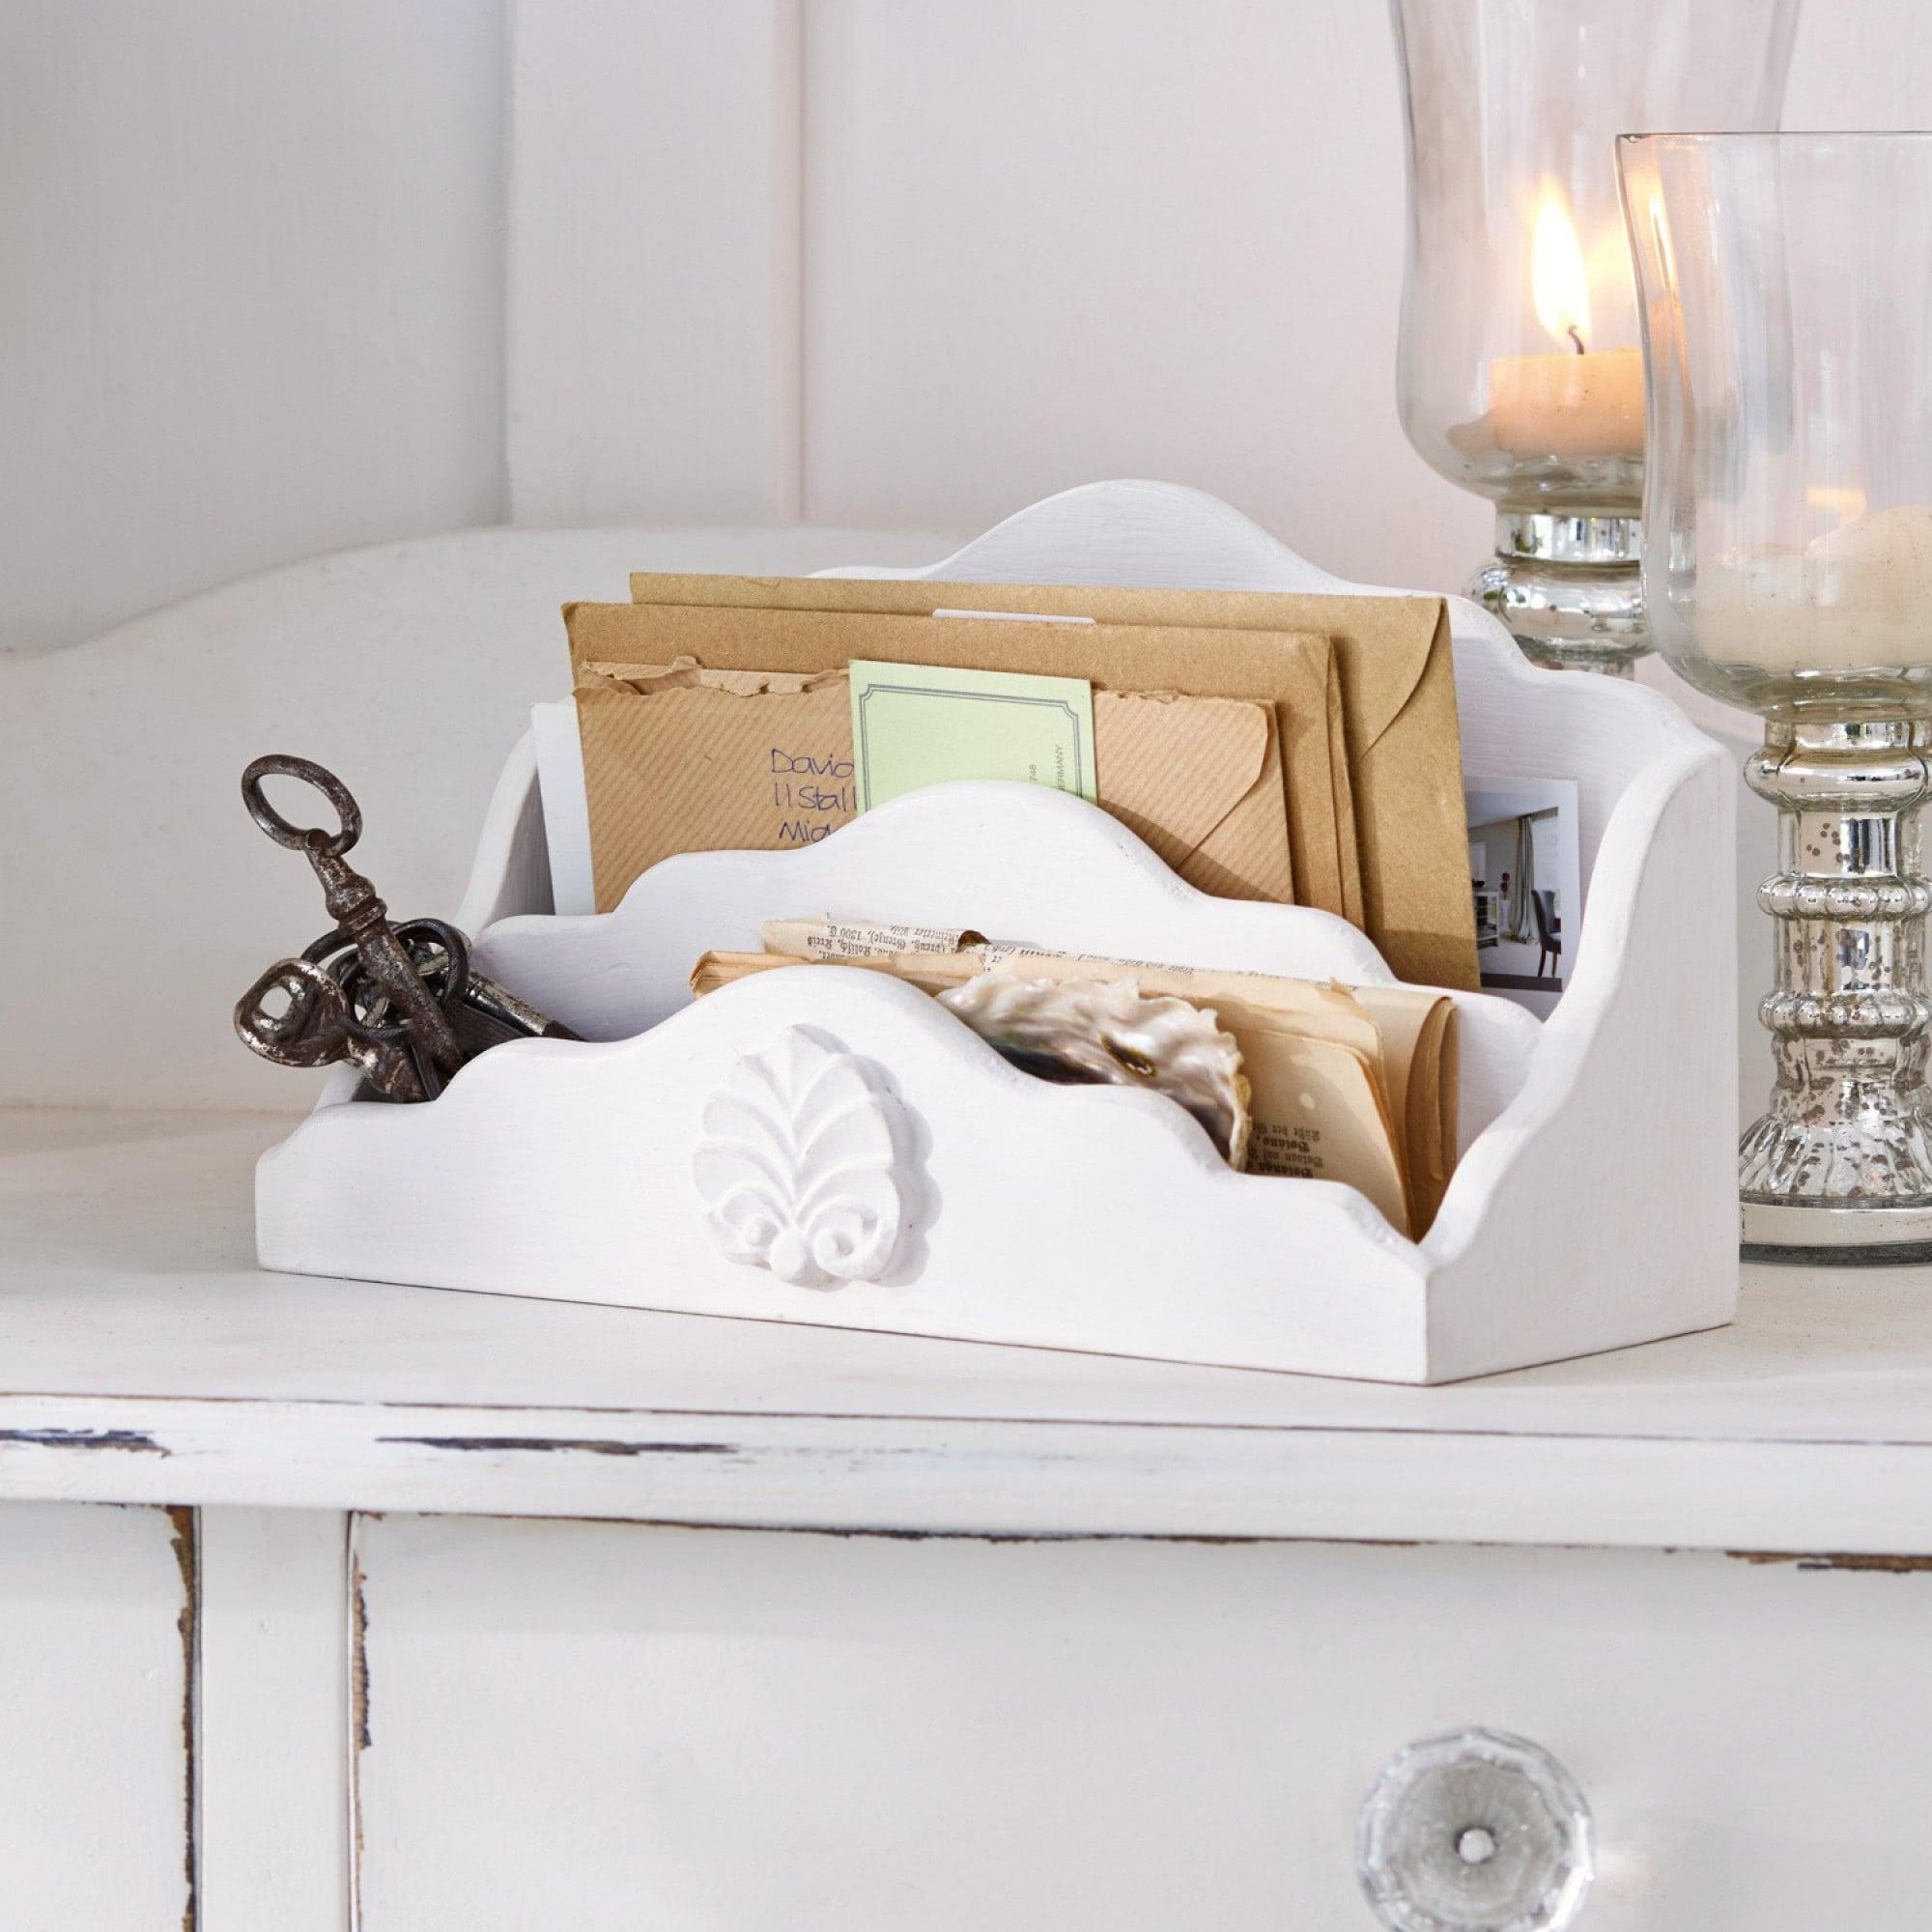 organizer luik loberon coming home. Black Bedroom Furniture Sets. Home Design Ideas